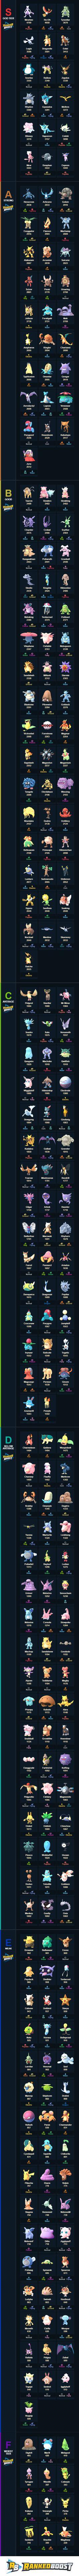 Pokemon GO Best Pokemon Tier List, Legendary Pokemon Included. (UPDATED 7/27/2017)